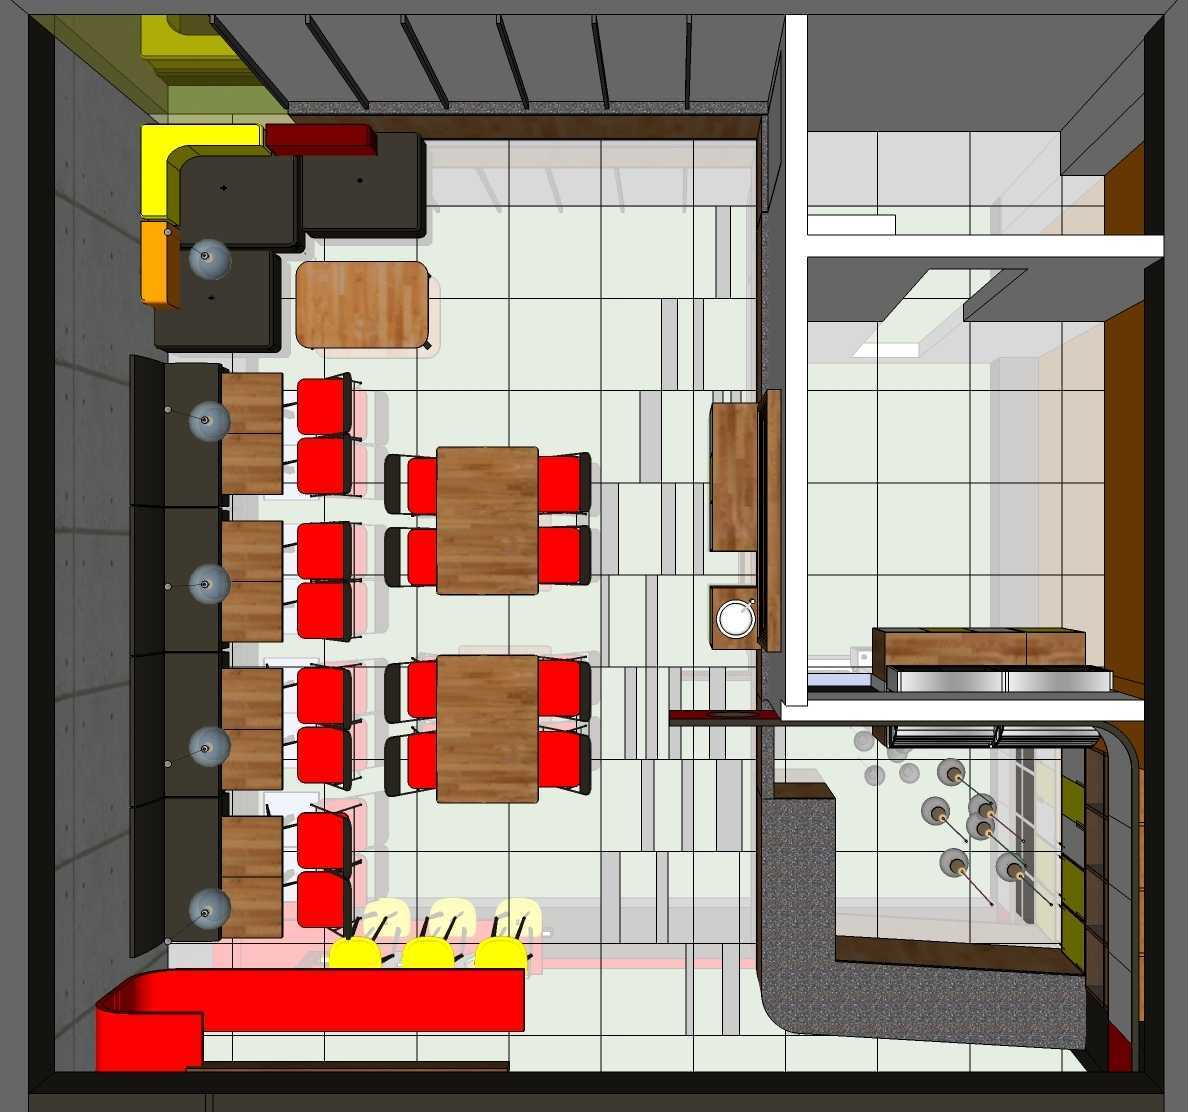 Mki Interior Rfc Plaza Pondok Gede - Bekasi Barat Plaza Pondok Gede - Bekasi Barat Layout Modern 20594